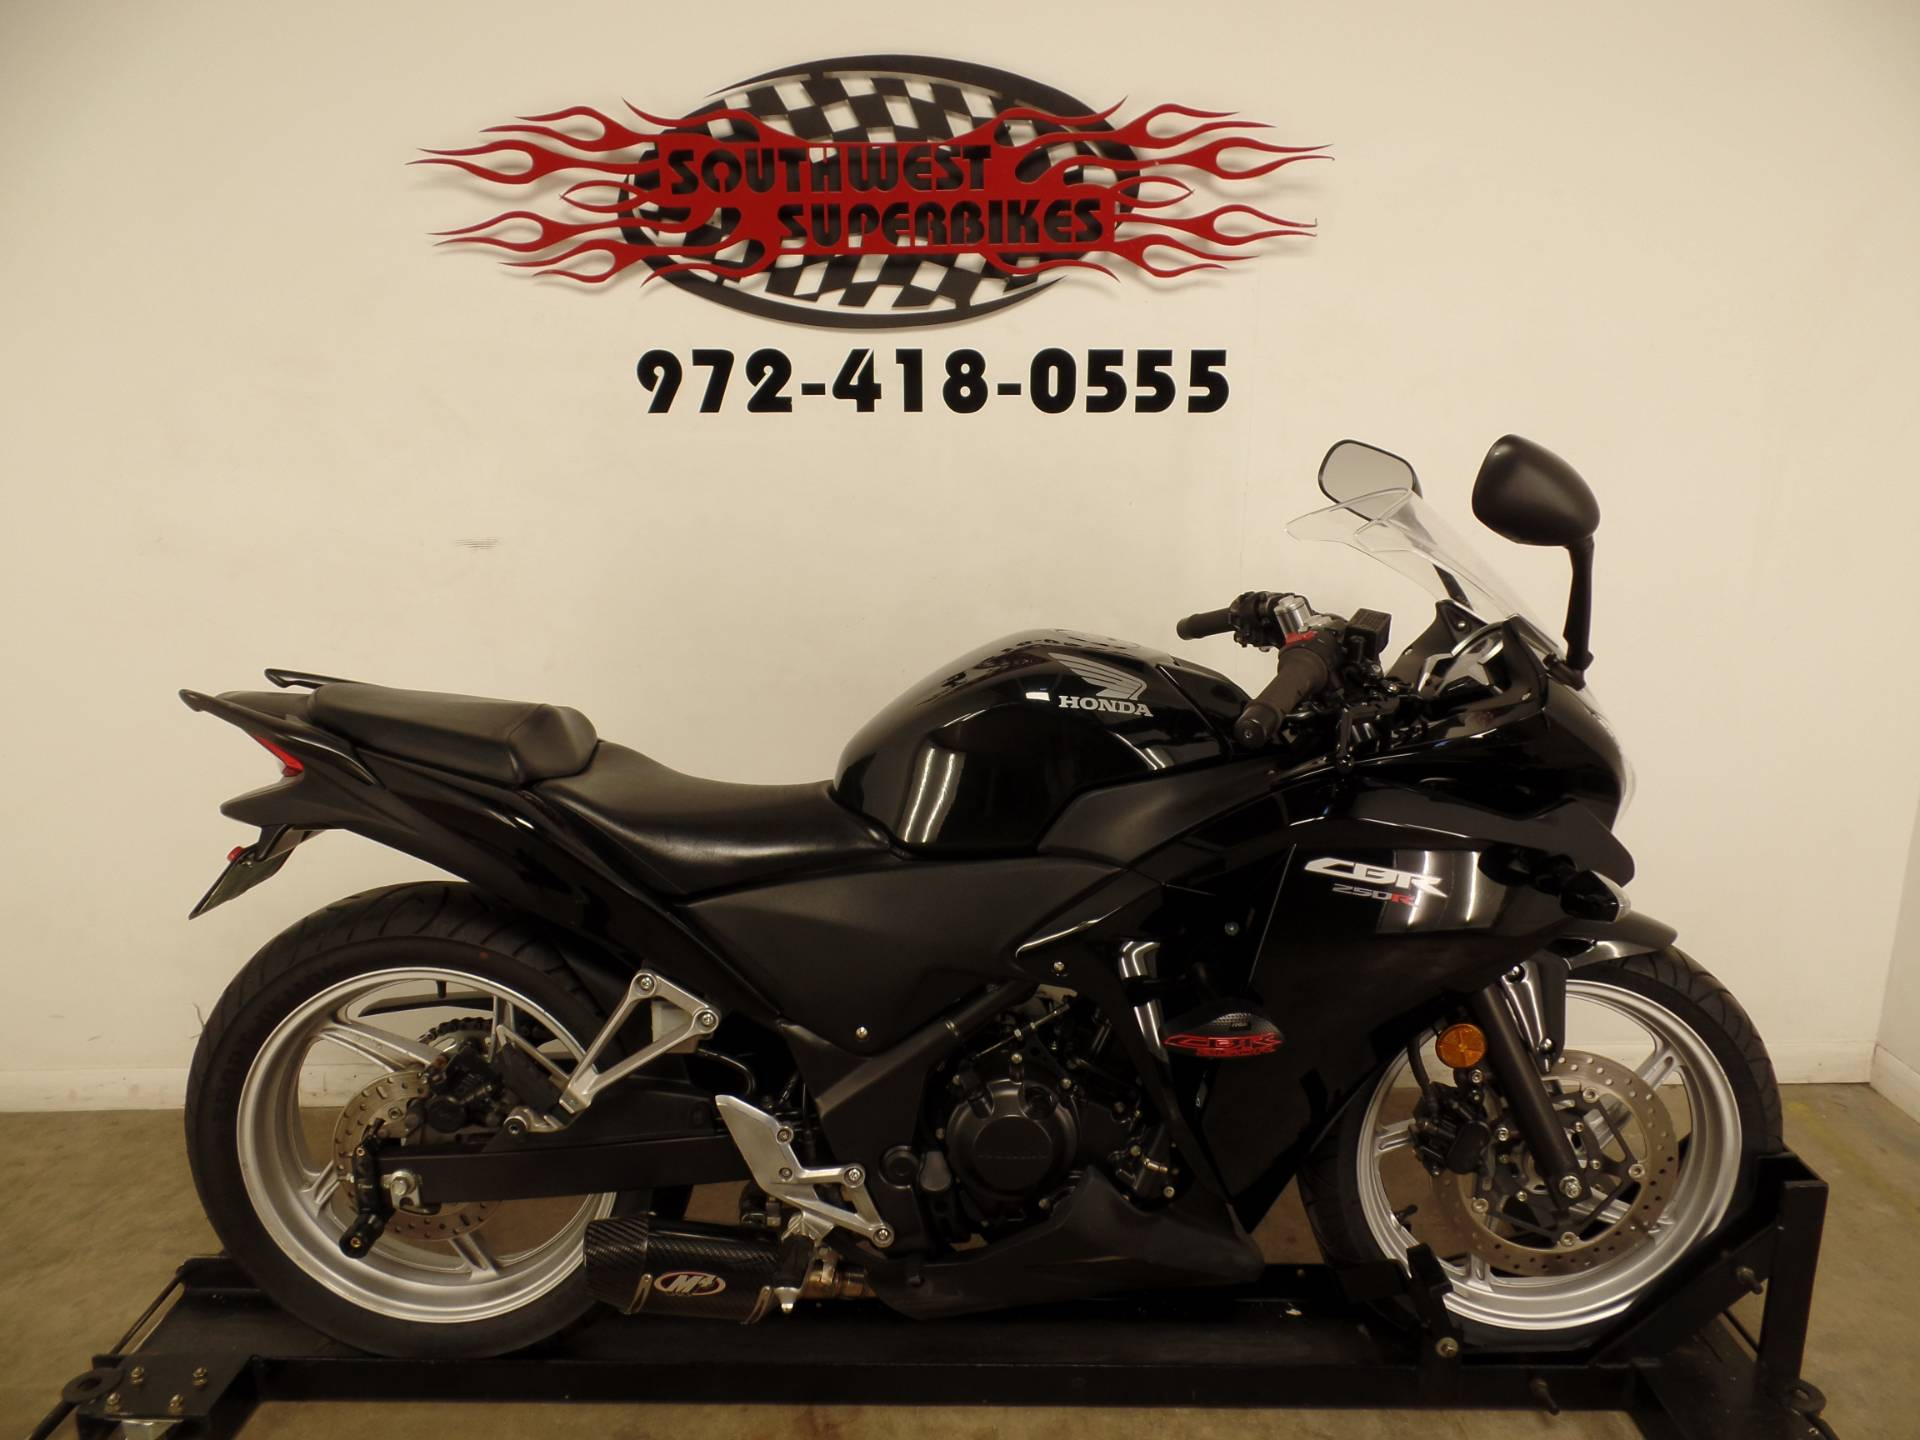 Used 2012 honda cbr 250r abs motorcycles in dallas tx for Honda motorcycle dealer dallas